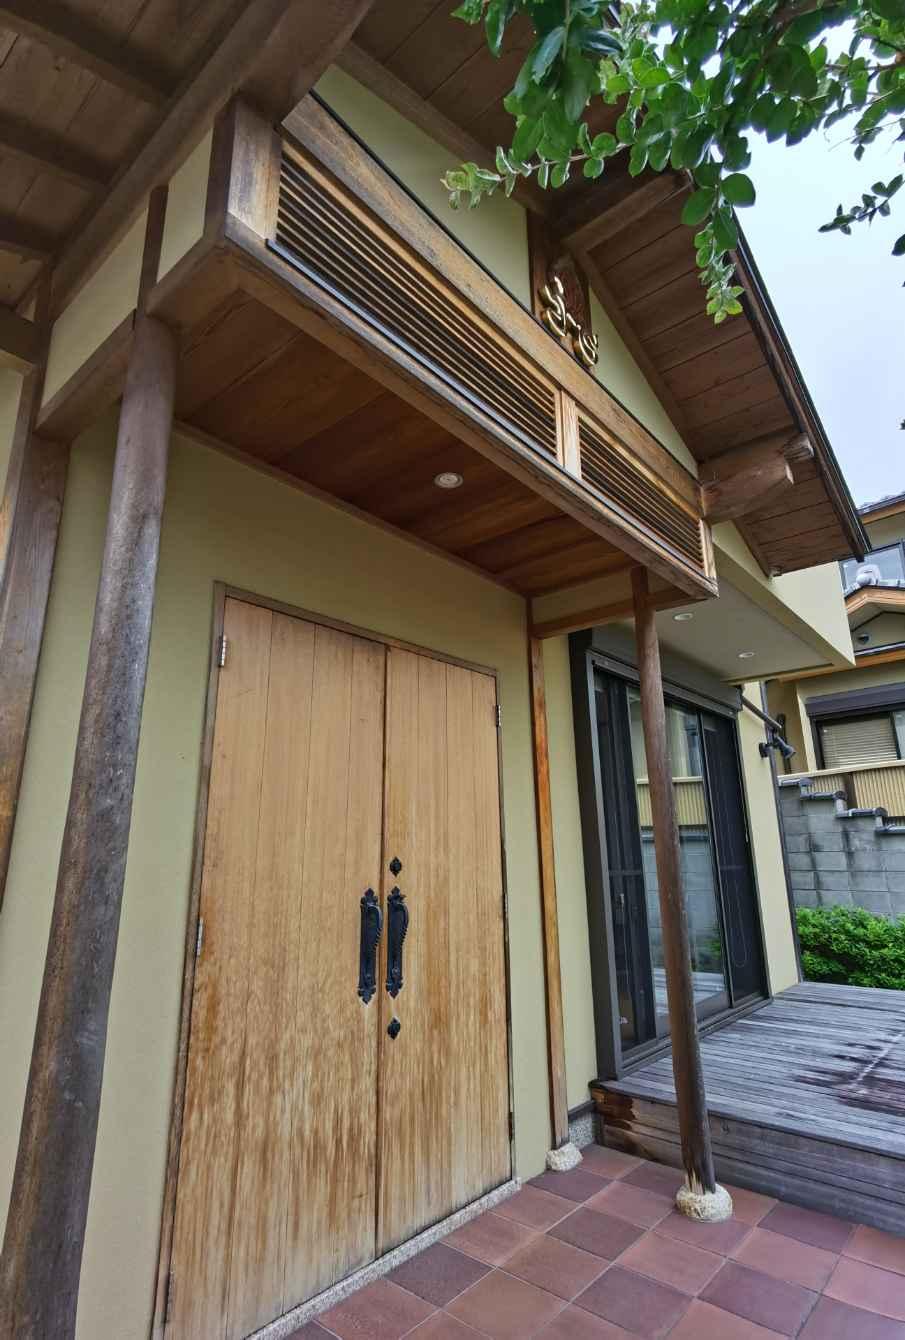 House for Sale in Okazaki Shinnyodomaecho, for Vacation or for Rent, in Sakyo Wardnear Yoshida mt., Kyoto